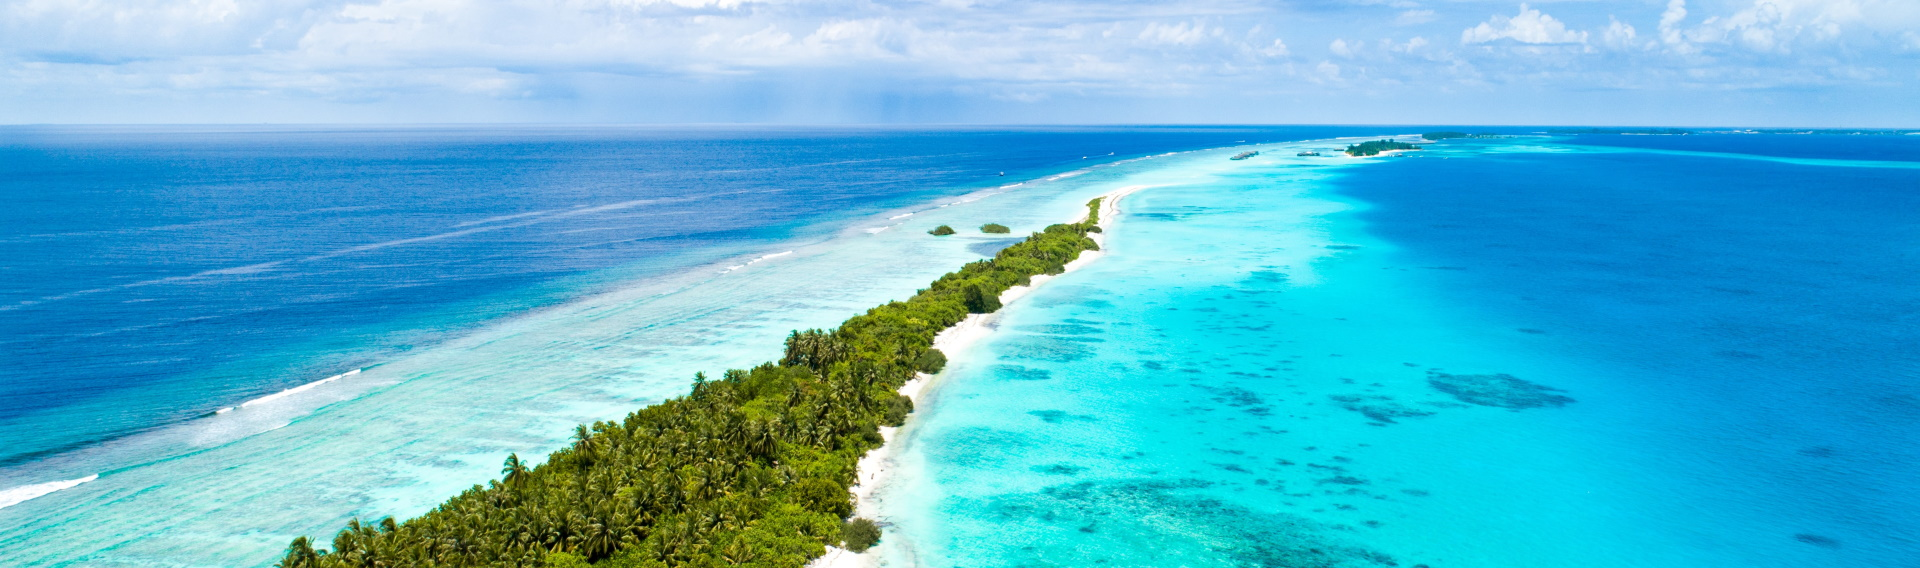 Malediven-Reise Expats